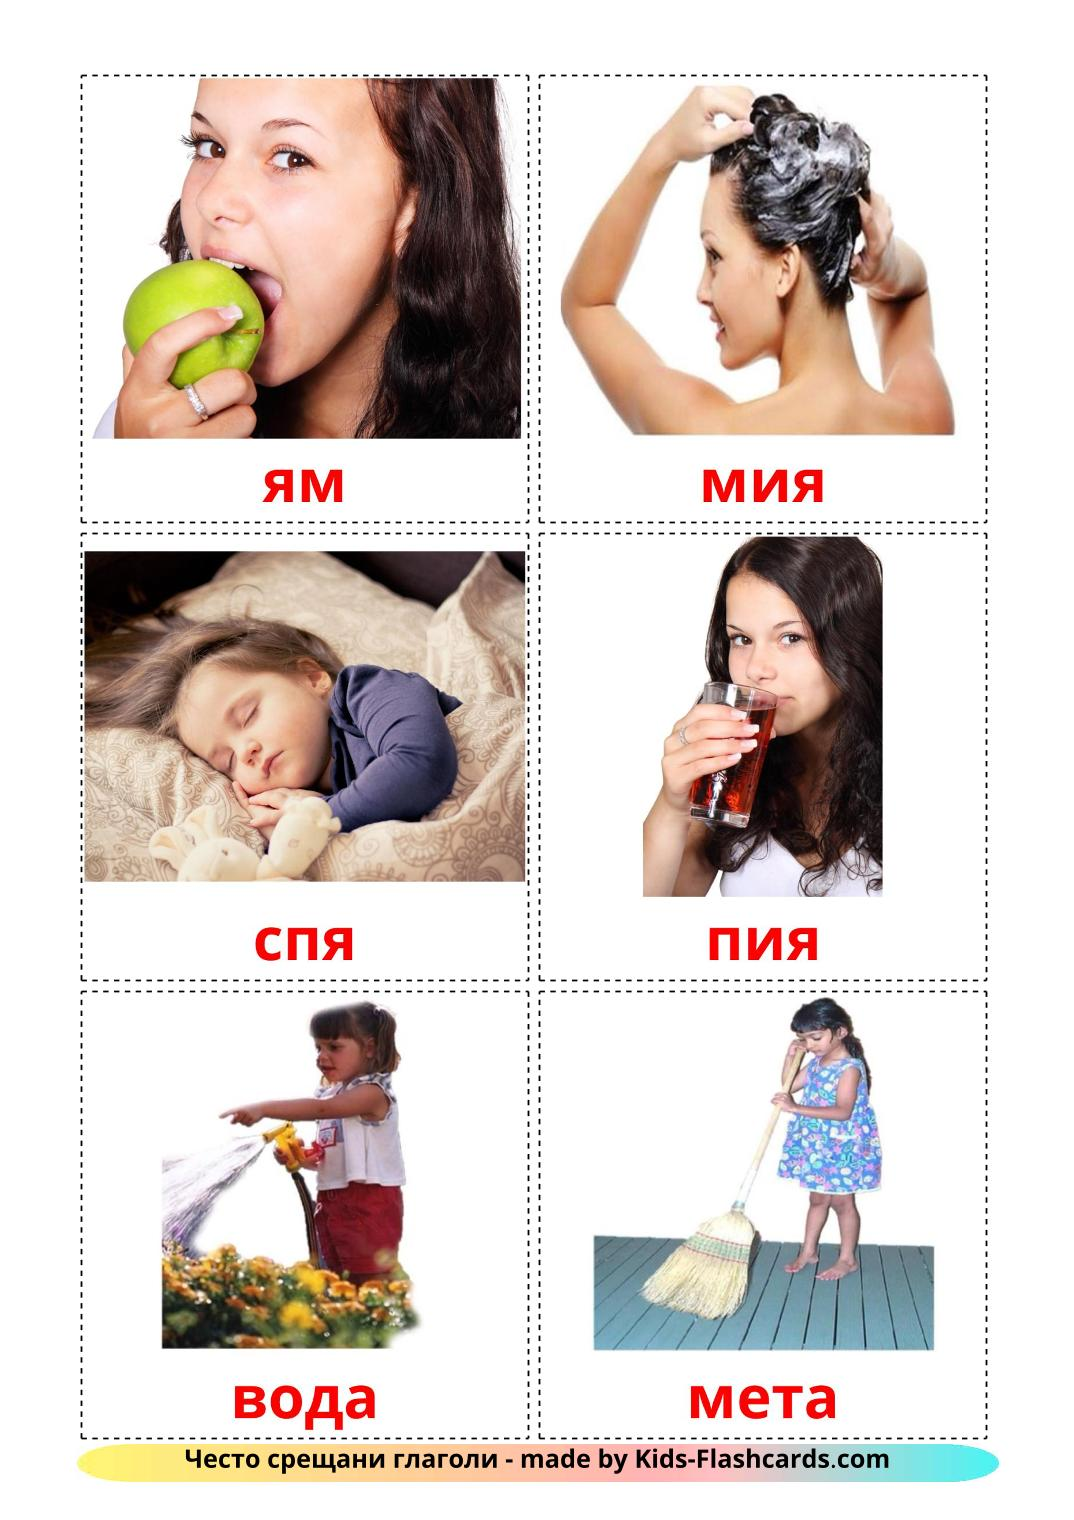 Routine verbs - 33 Free Printable bulgarian Flashcards